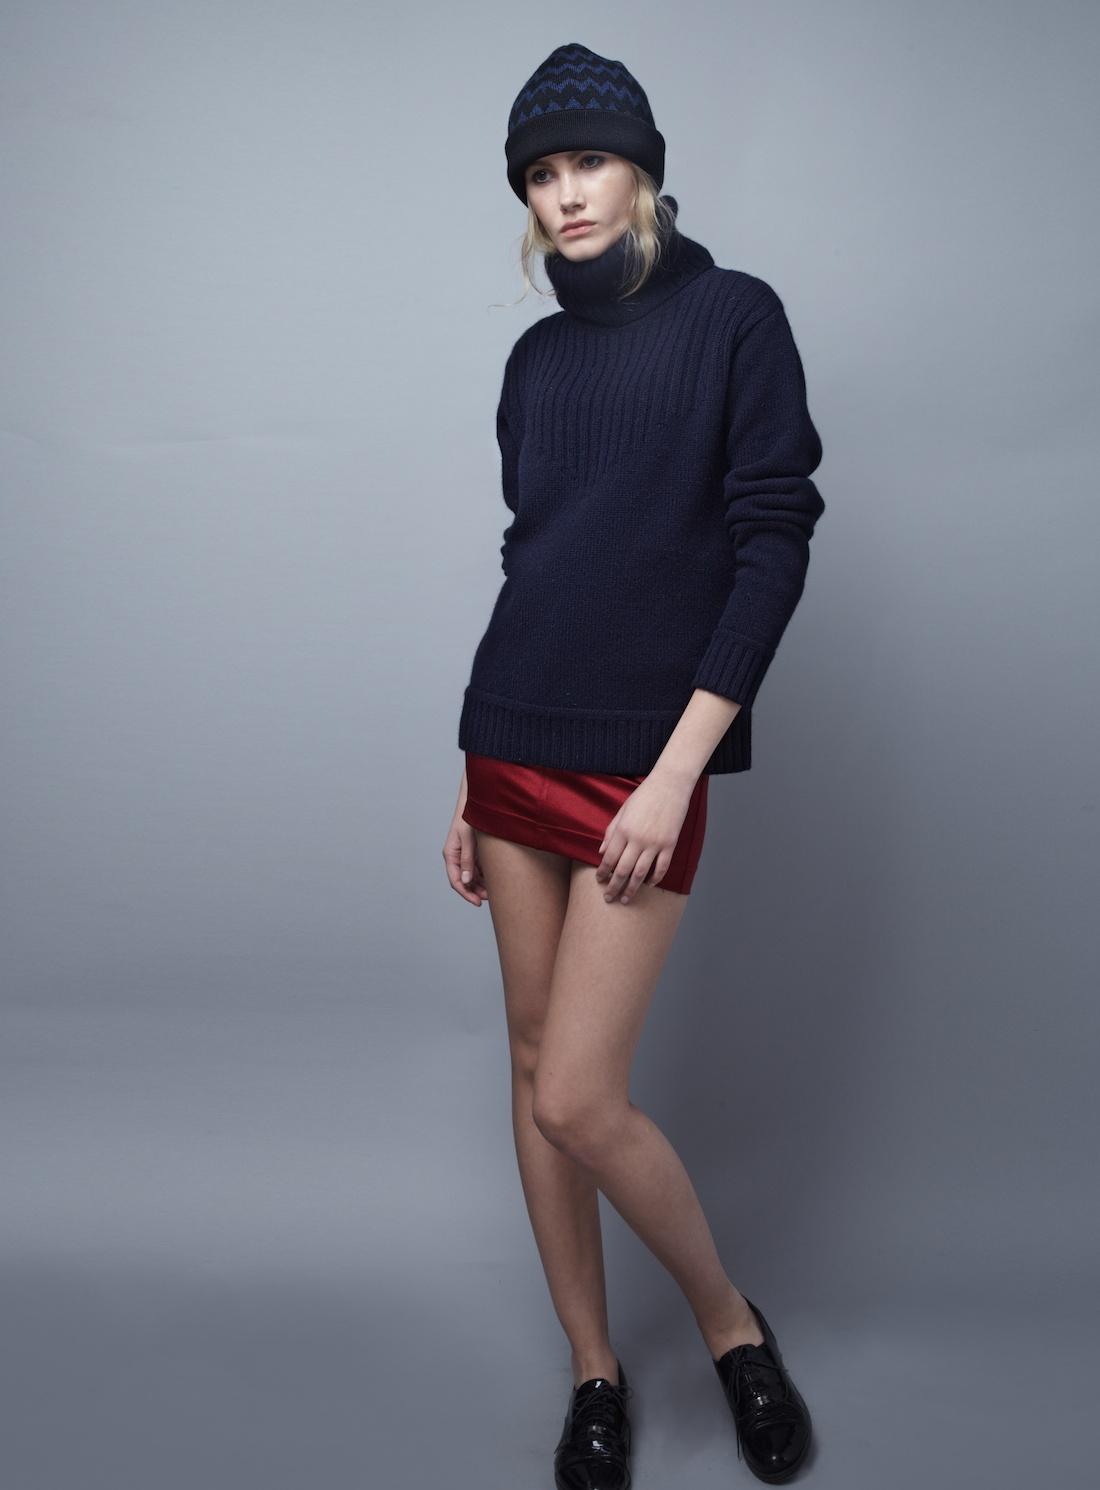 Blake ldn Navy Redfern Turtleneck Sweater- Last One By in Blue | Lyst